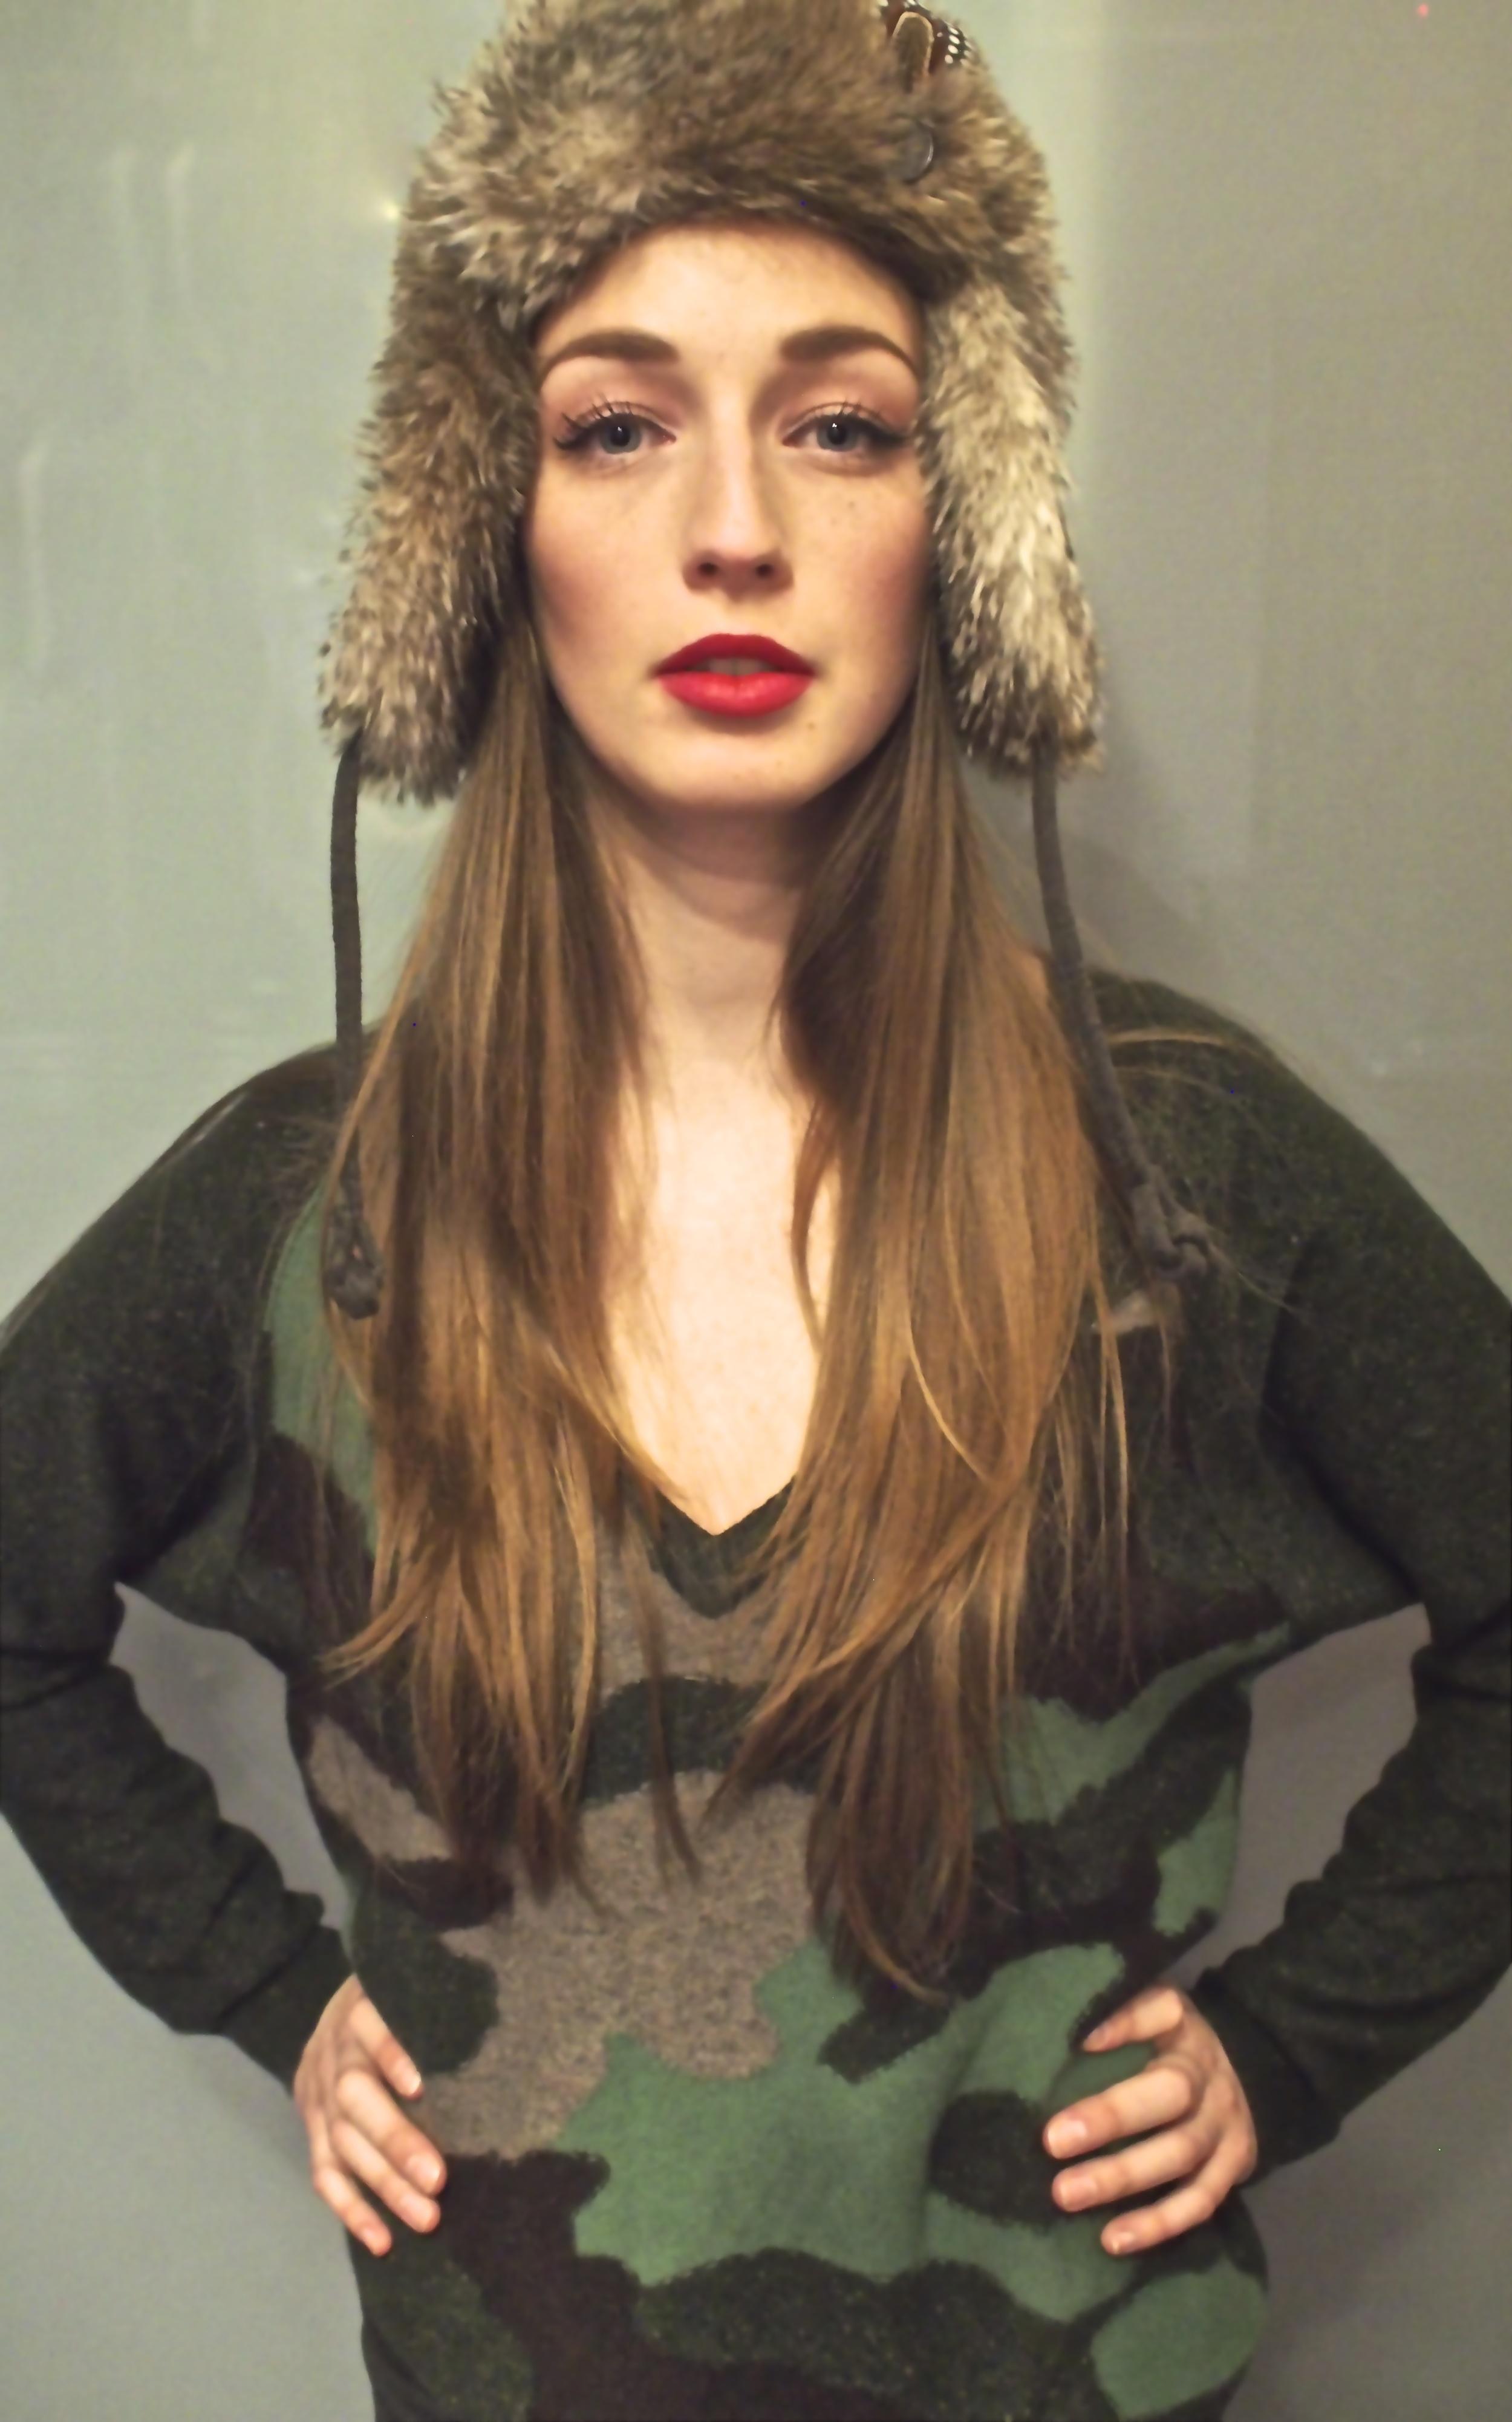 Nobis-Faux Fur Trapper Hat $75, Autumn Cashmere-Camo V Neck Sweater $375, JBrand Skinny Jean $269